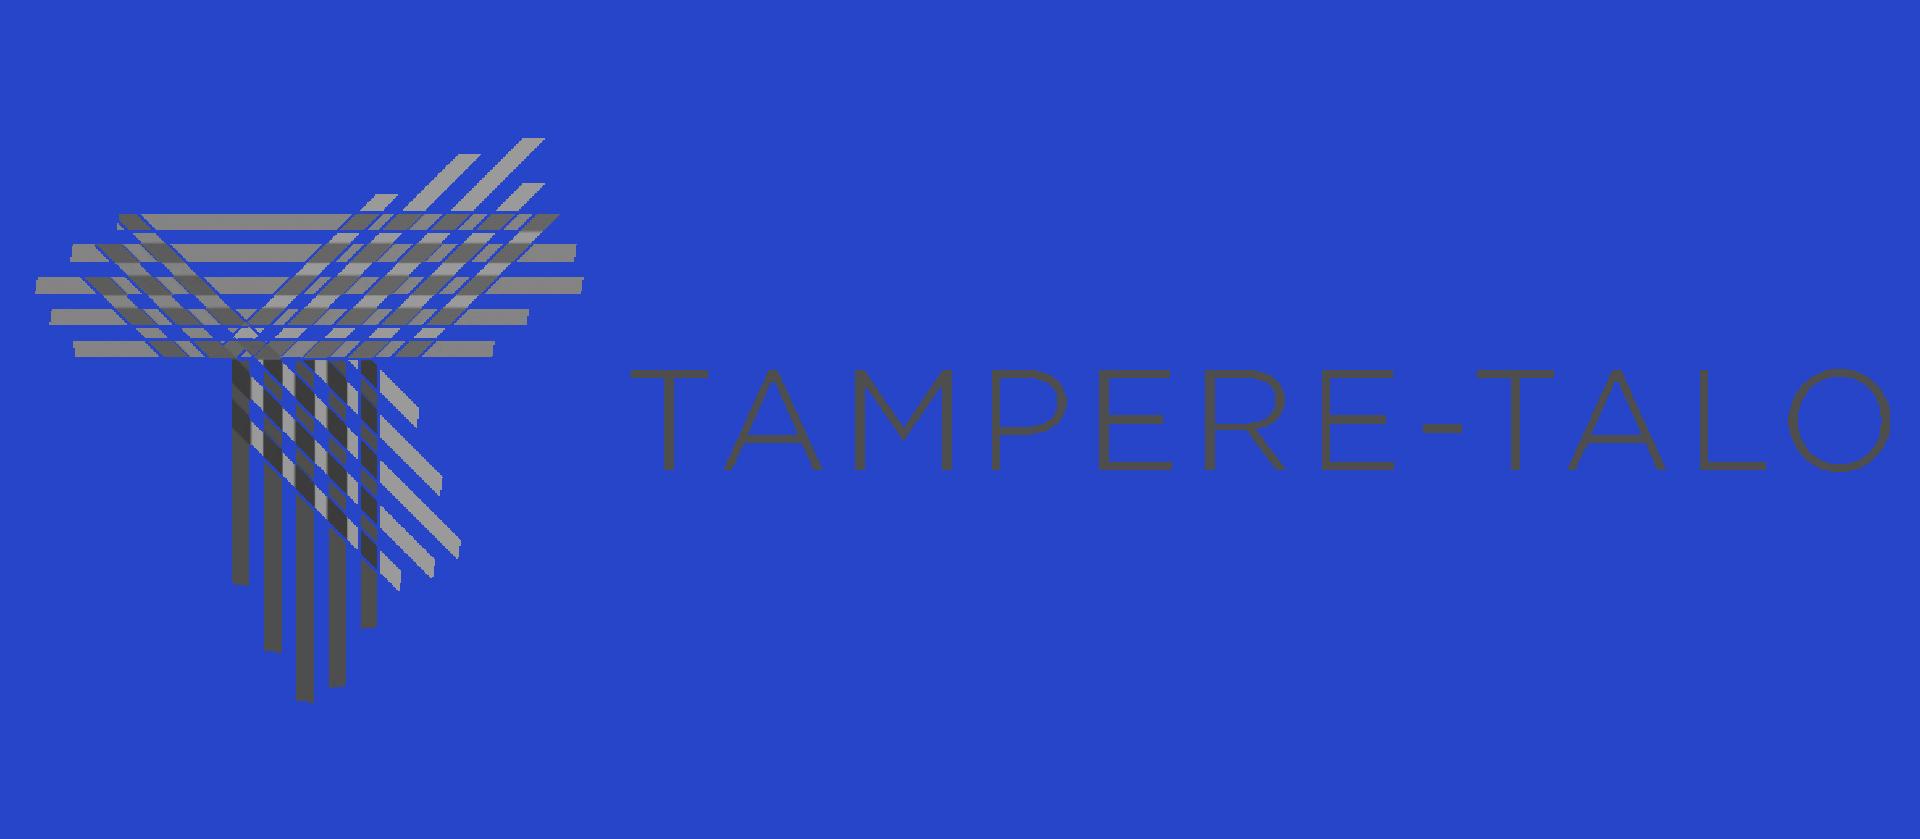 Tampere-talo logo mustavalko